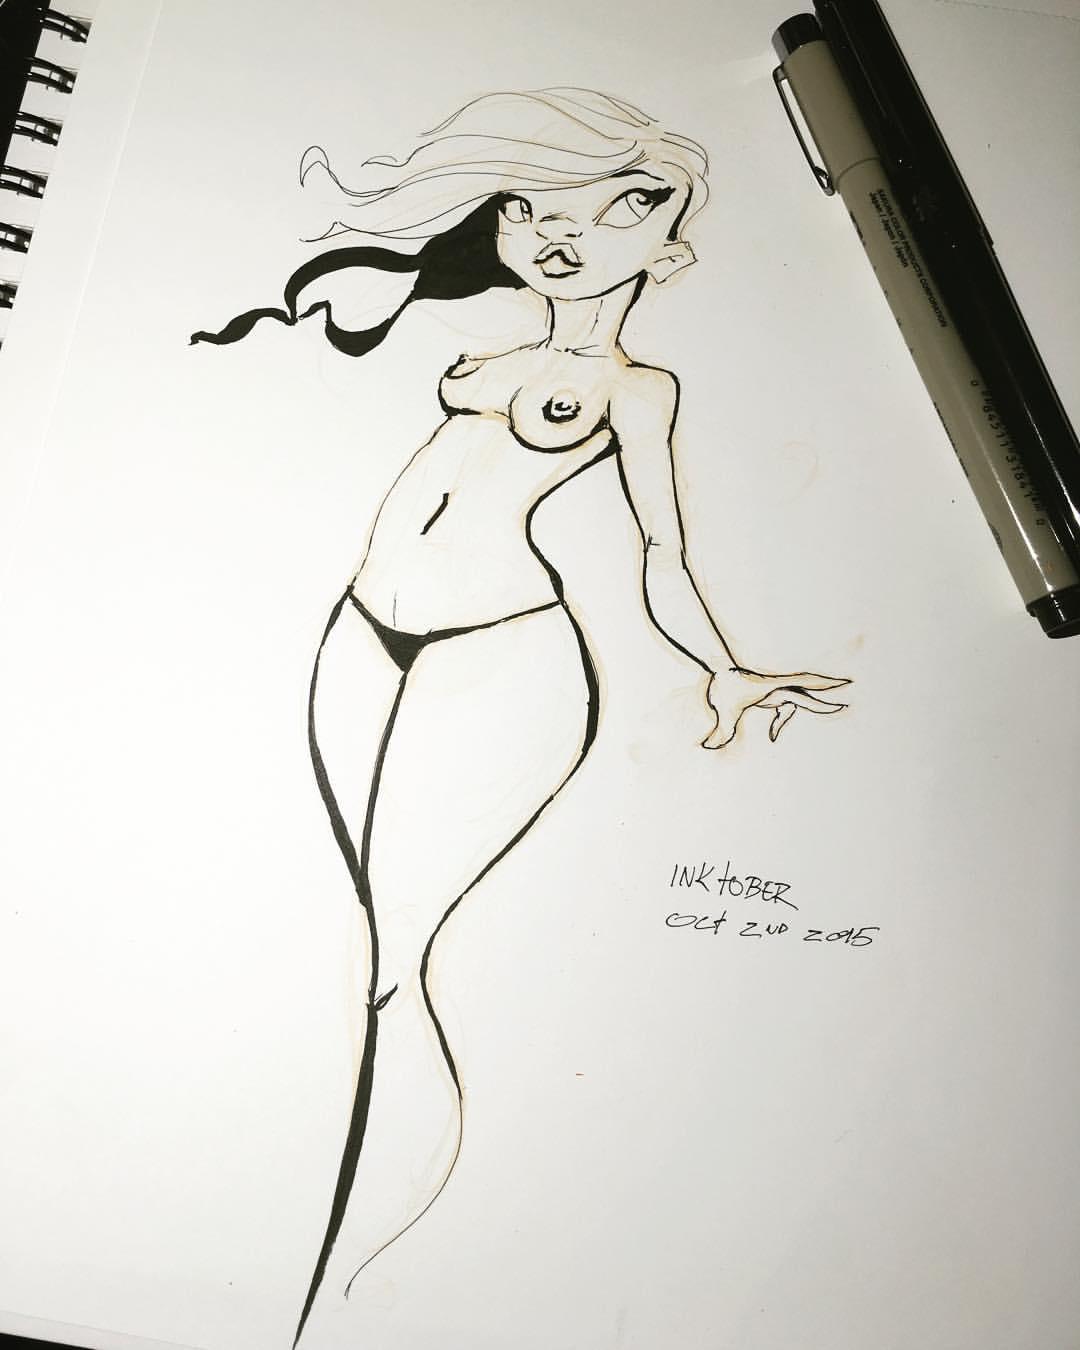 My late start on inktober   #inktober #inktober2015 #ink #sketch #sketchbook #girlsketch #pentelbrushpen